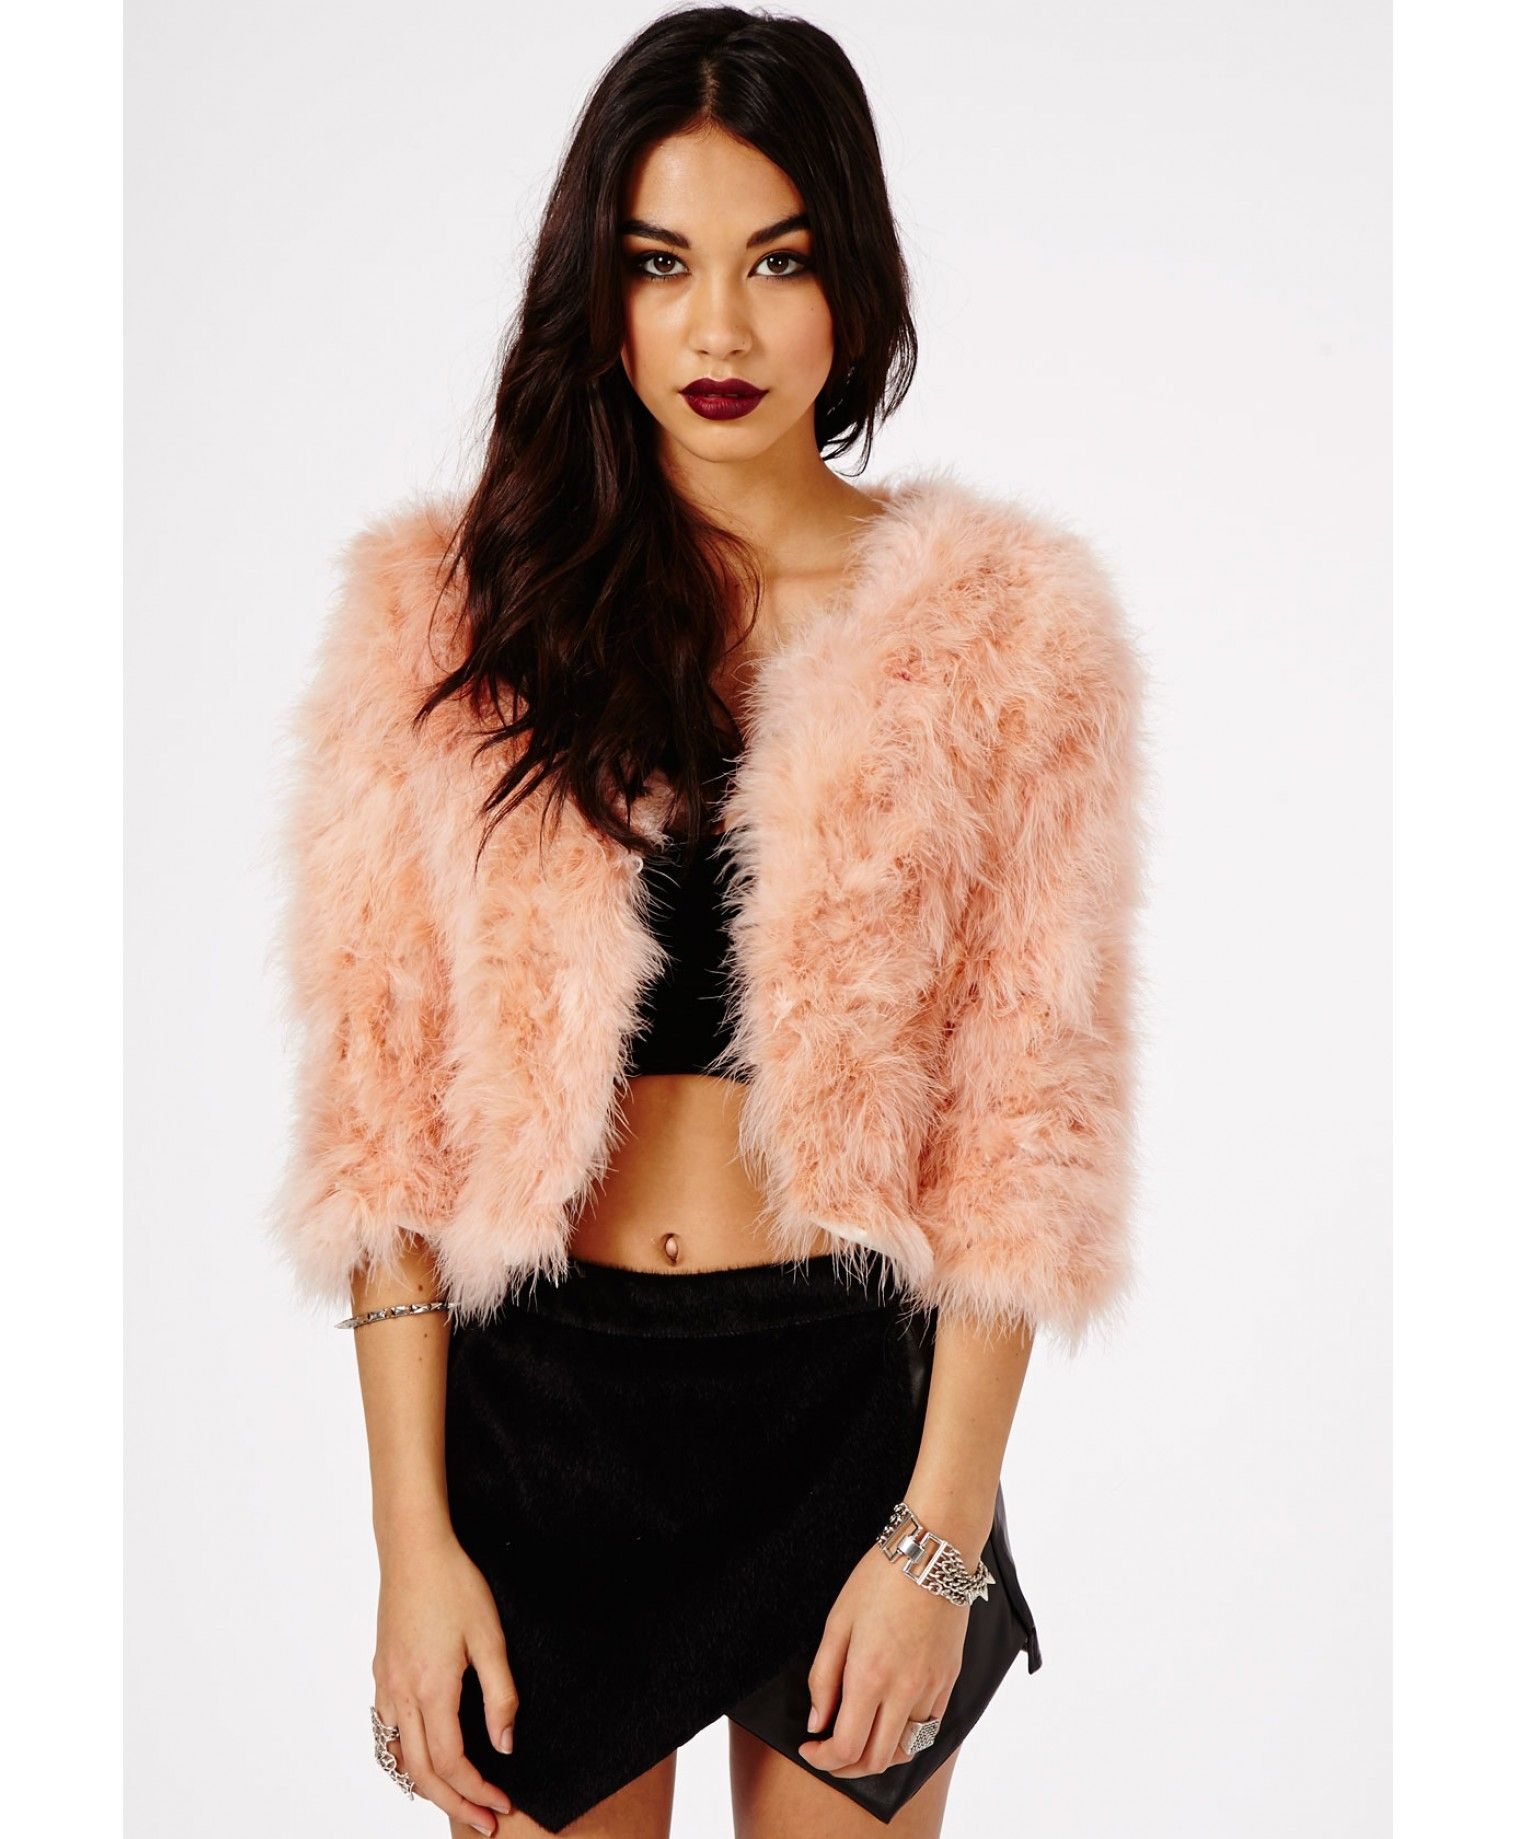 defbfbe19e9 Eleasha Pink Faux Feather Coat - Coats & Jackets - Missguided ...